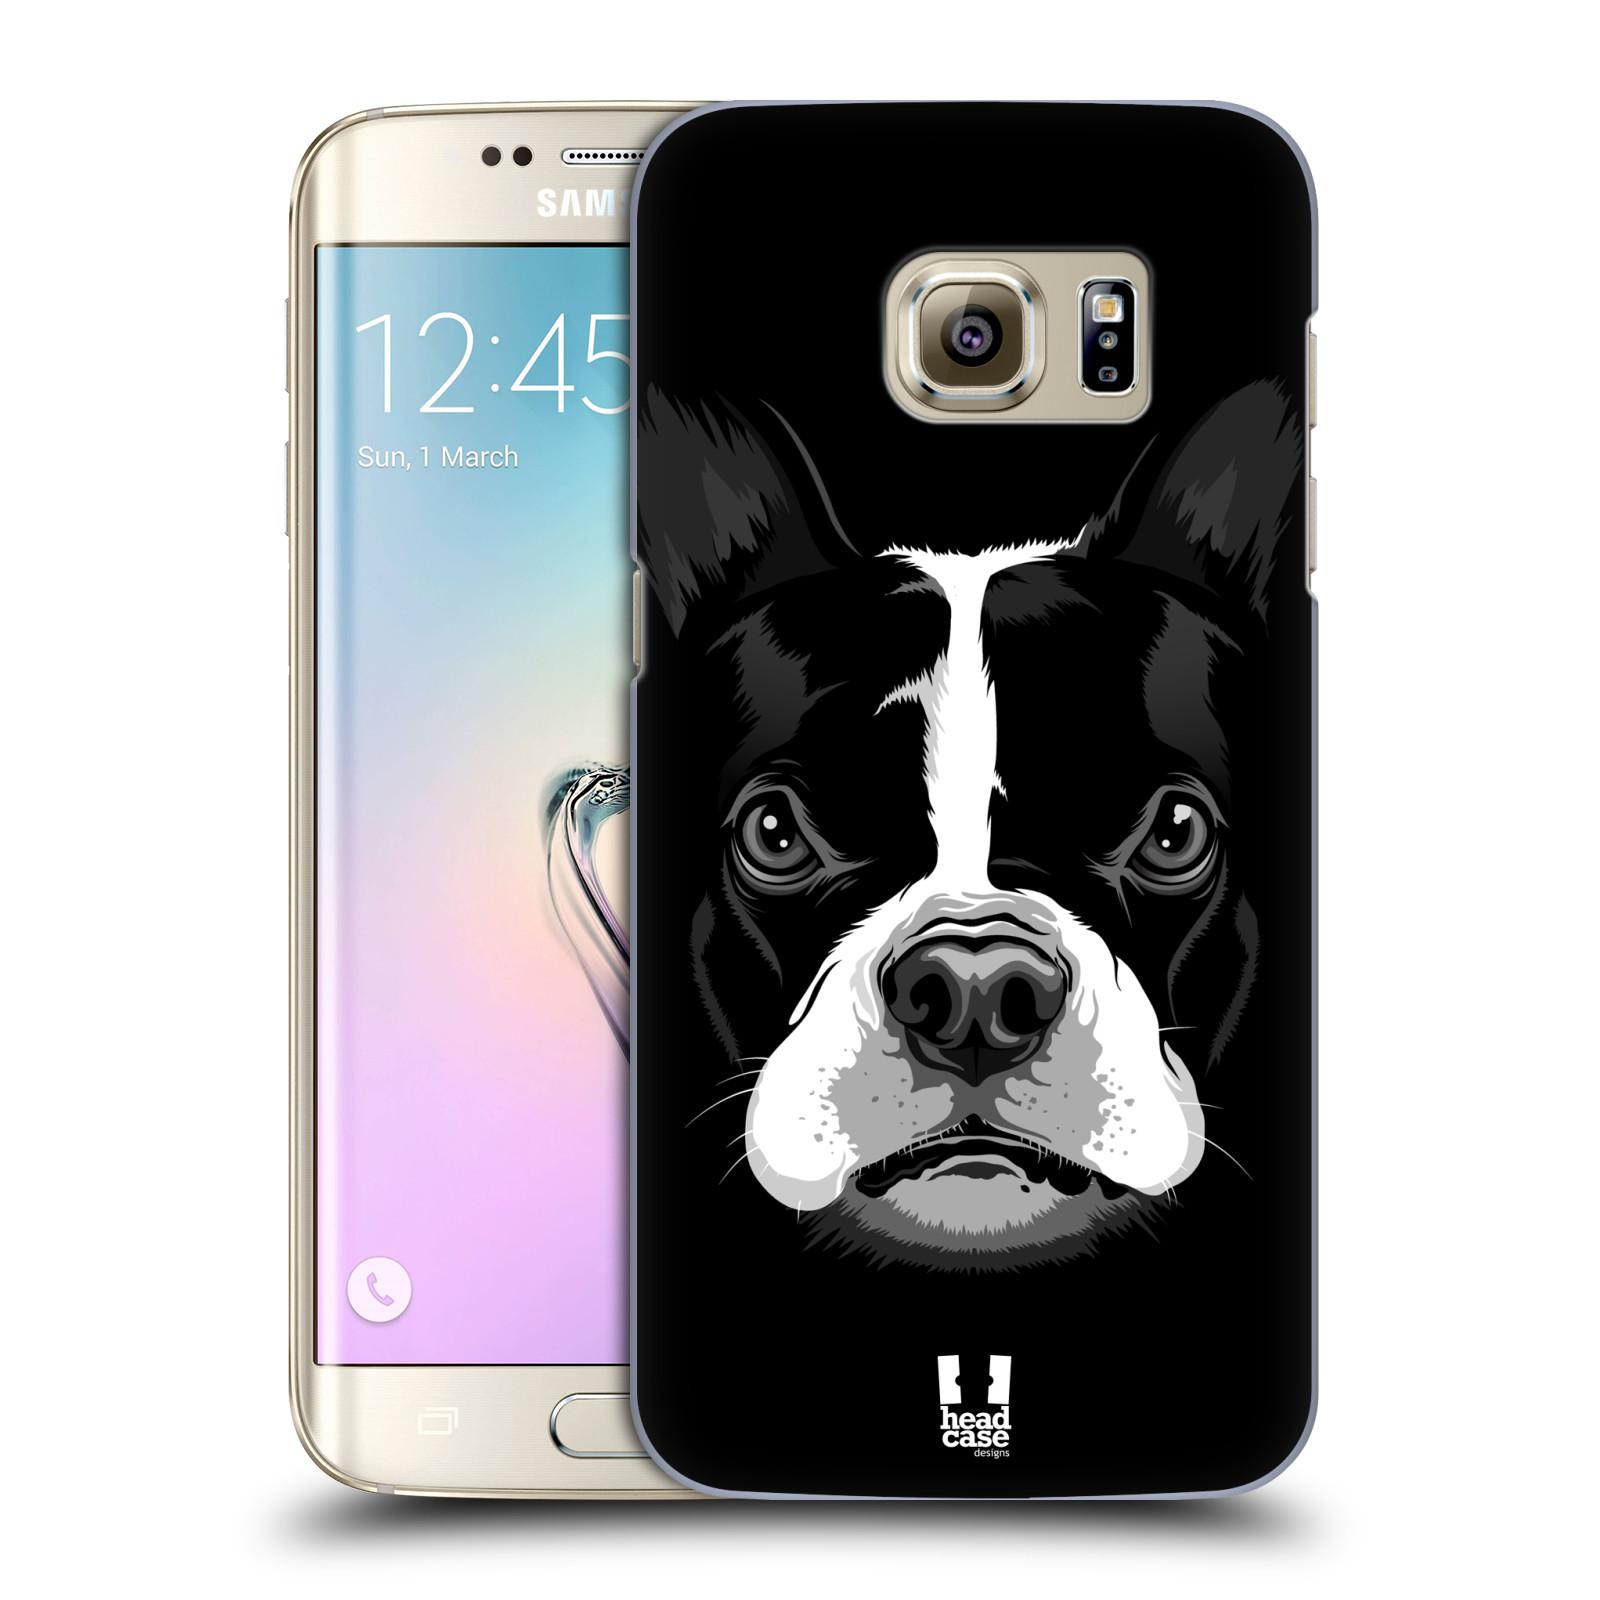 HEAD CASE plastový obal na mobil SAMSUNG GALAXY S7 EDGE vzor Zvíře kreslená tvář 2 buldok